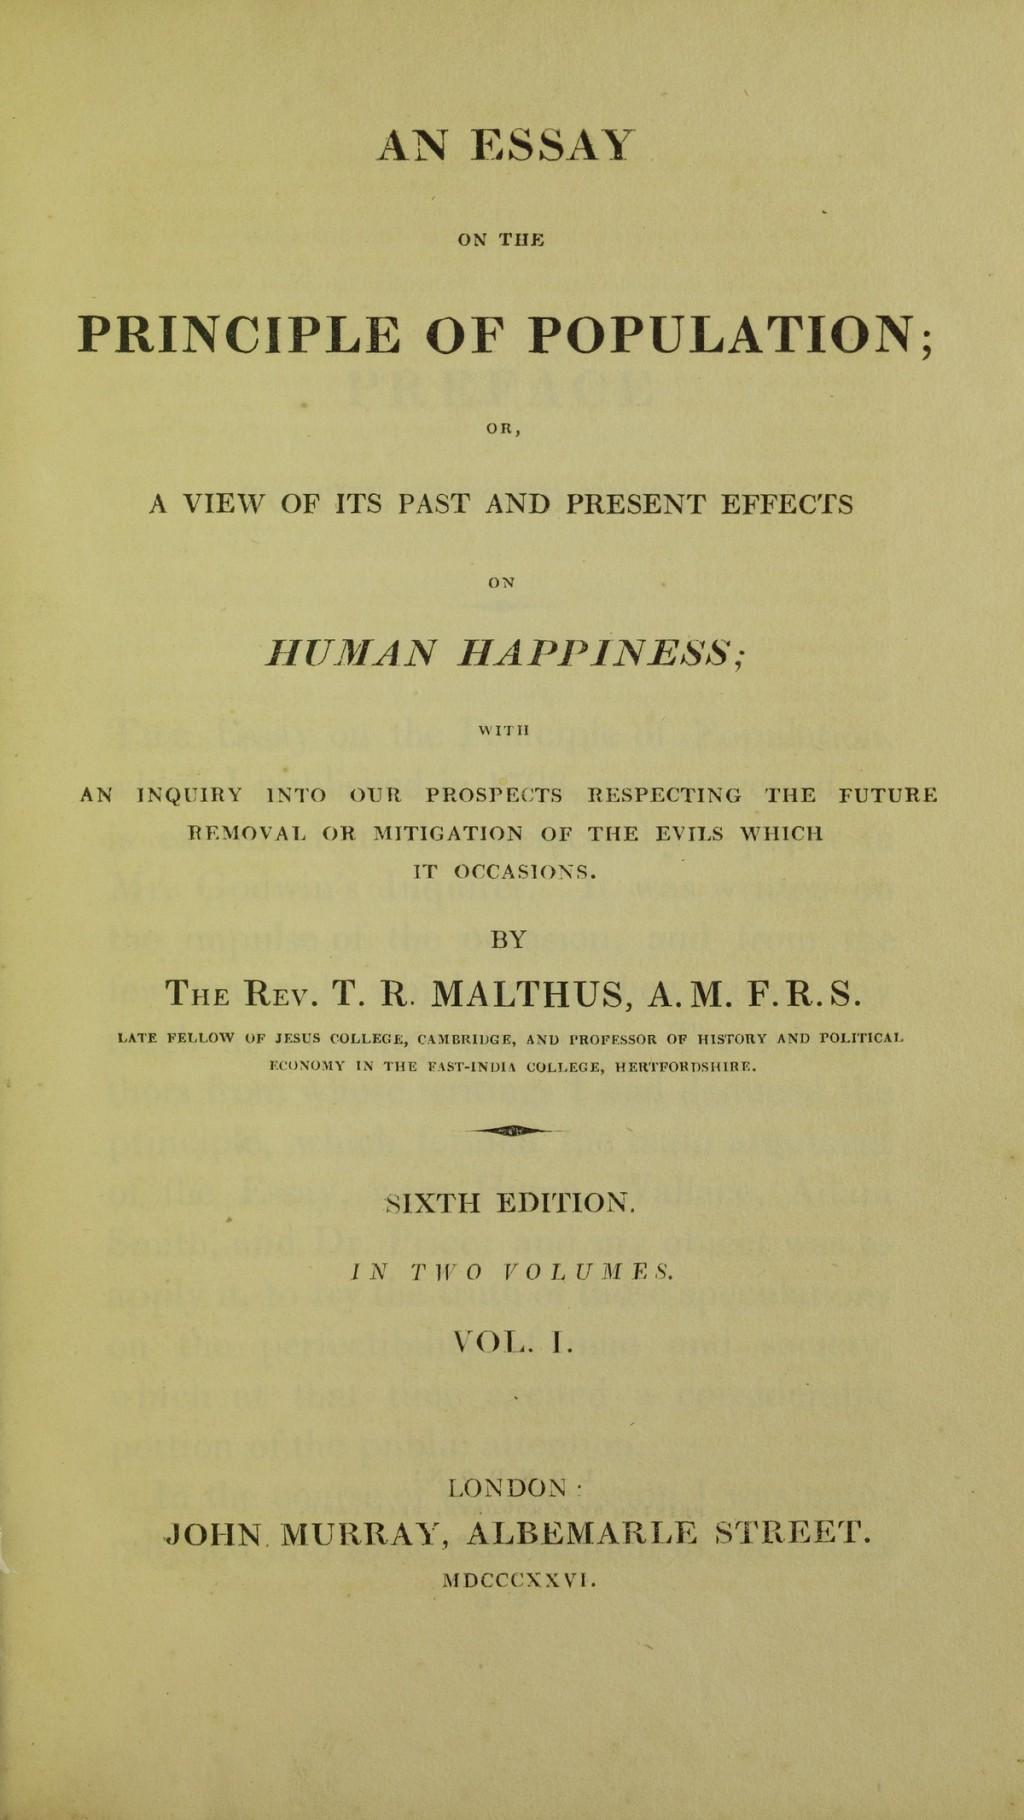 005 Thomas Malthus Essay On The Principle Of Population Lossy Page1 1200px  Population2c 1826 5884843 Tif Stupendous After Reading Malthus's Principles Darwin Got Idea That Ap EuroLarge